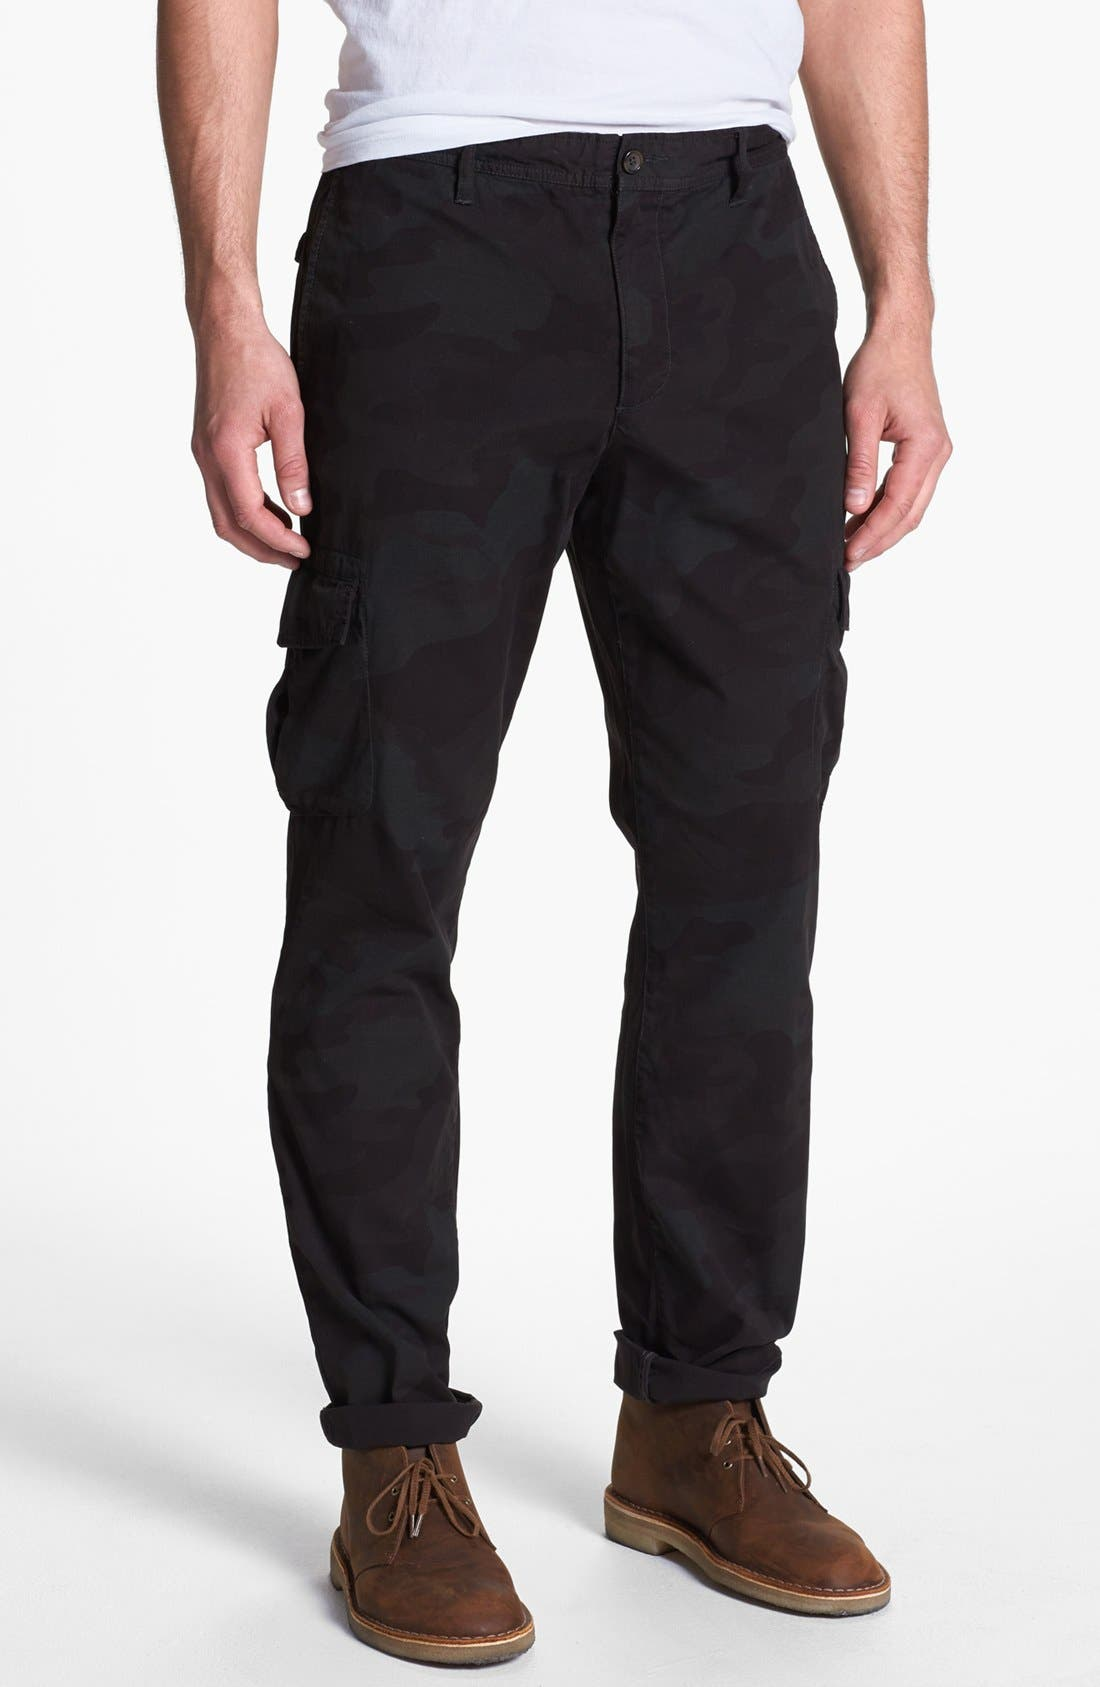 Alternate Image 1 Selected - Wallin & Bros. 'Riverbend' Camo Cargo Pants